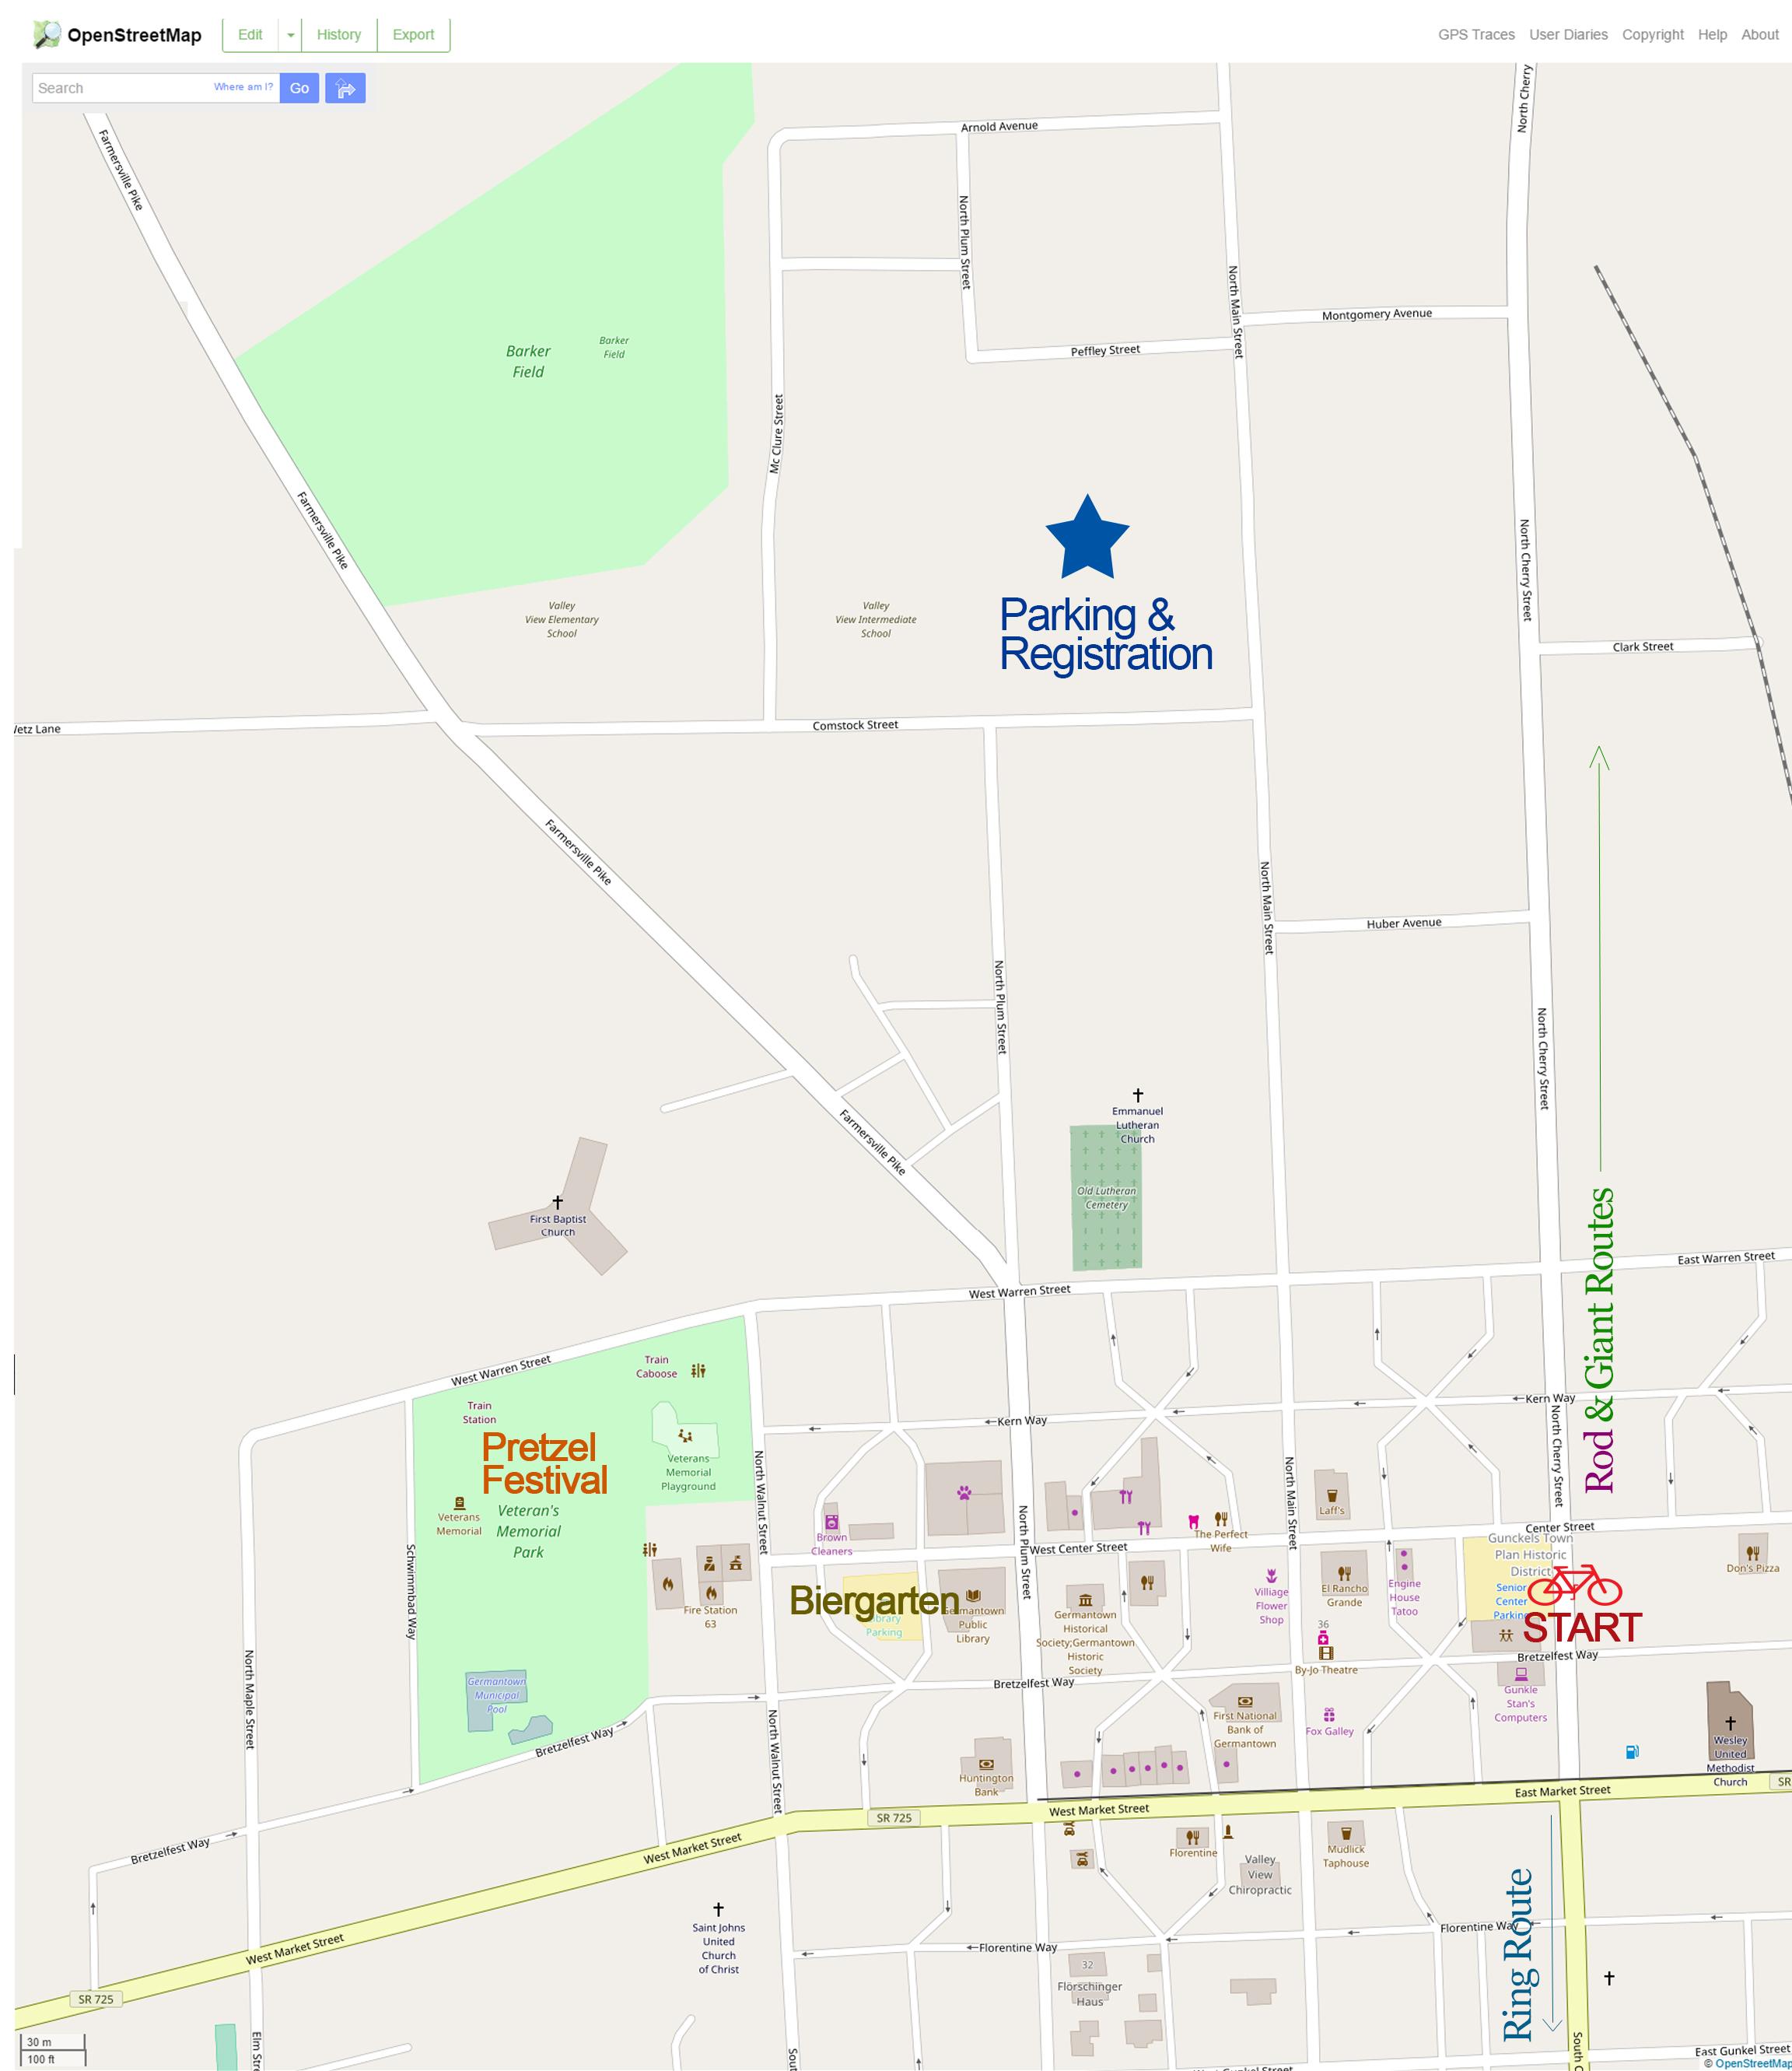 event area map